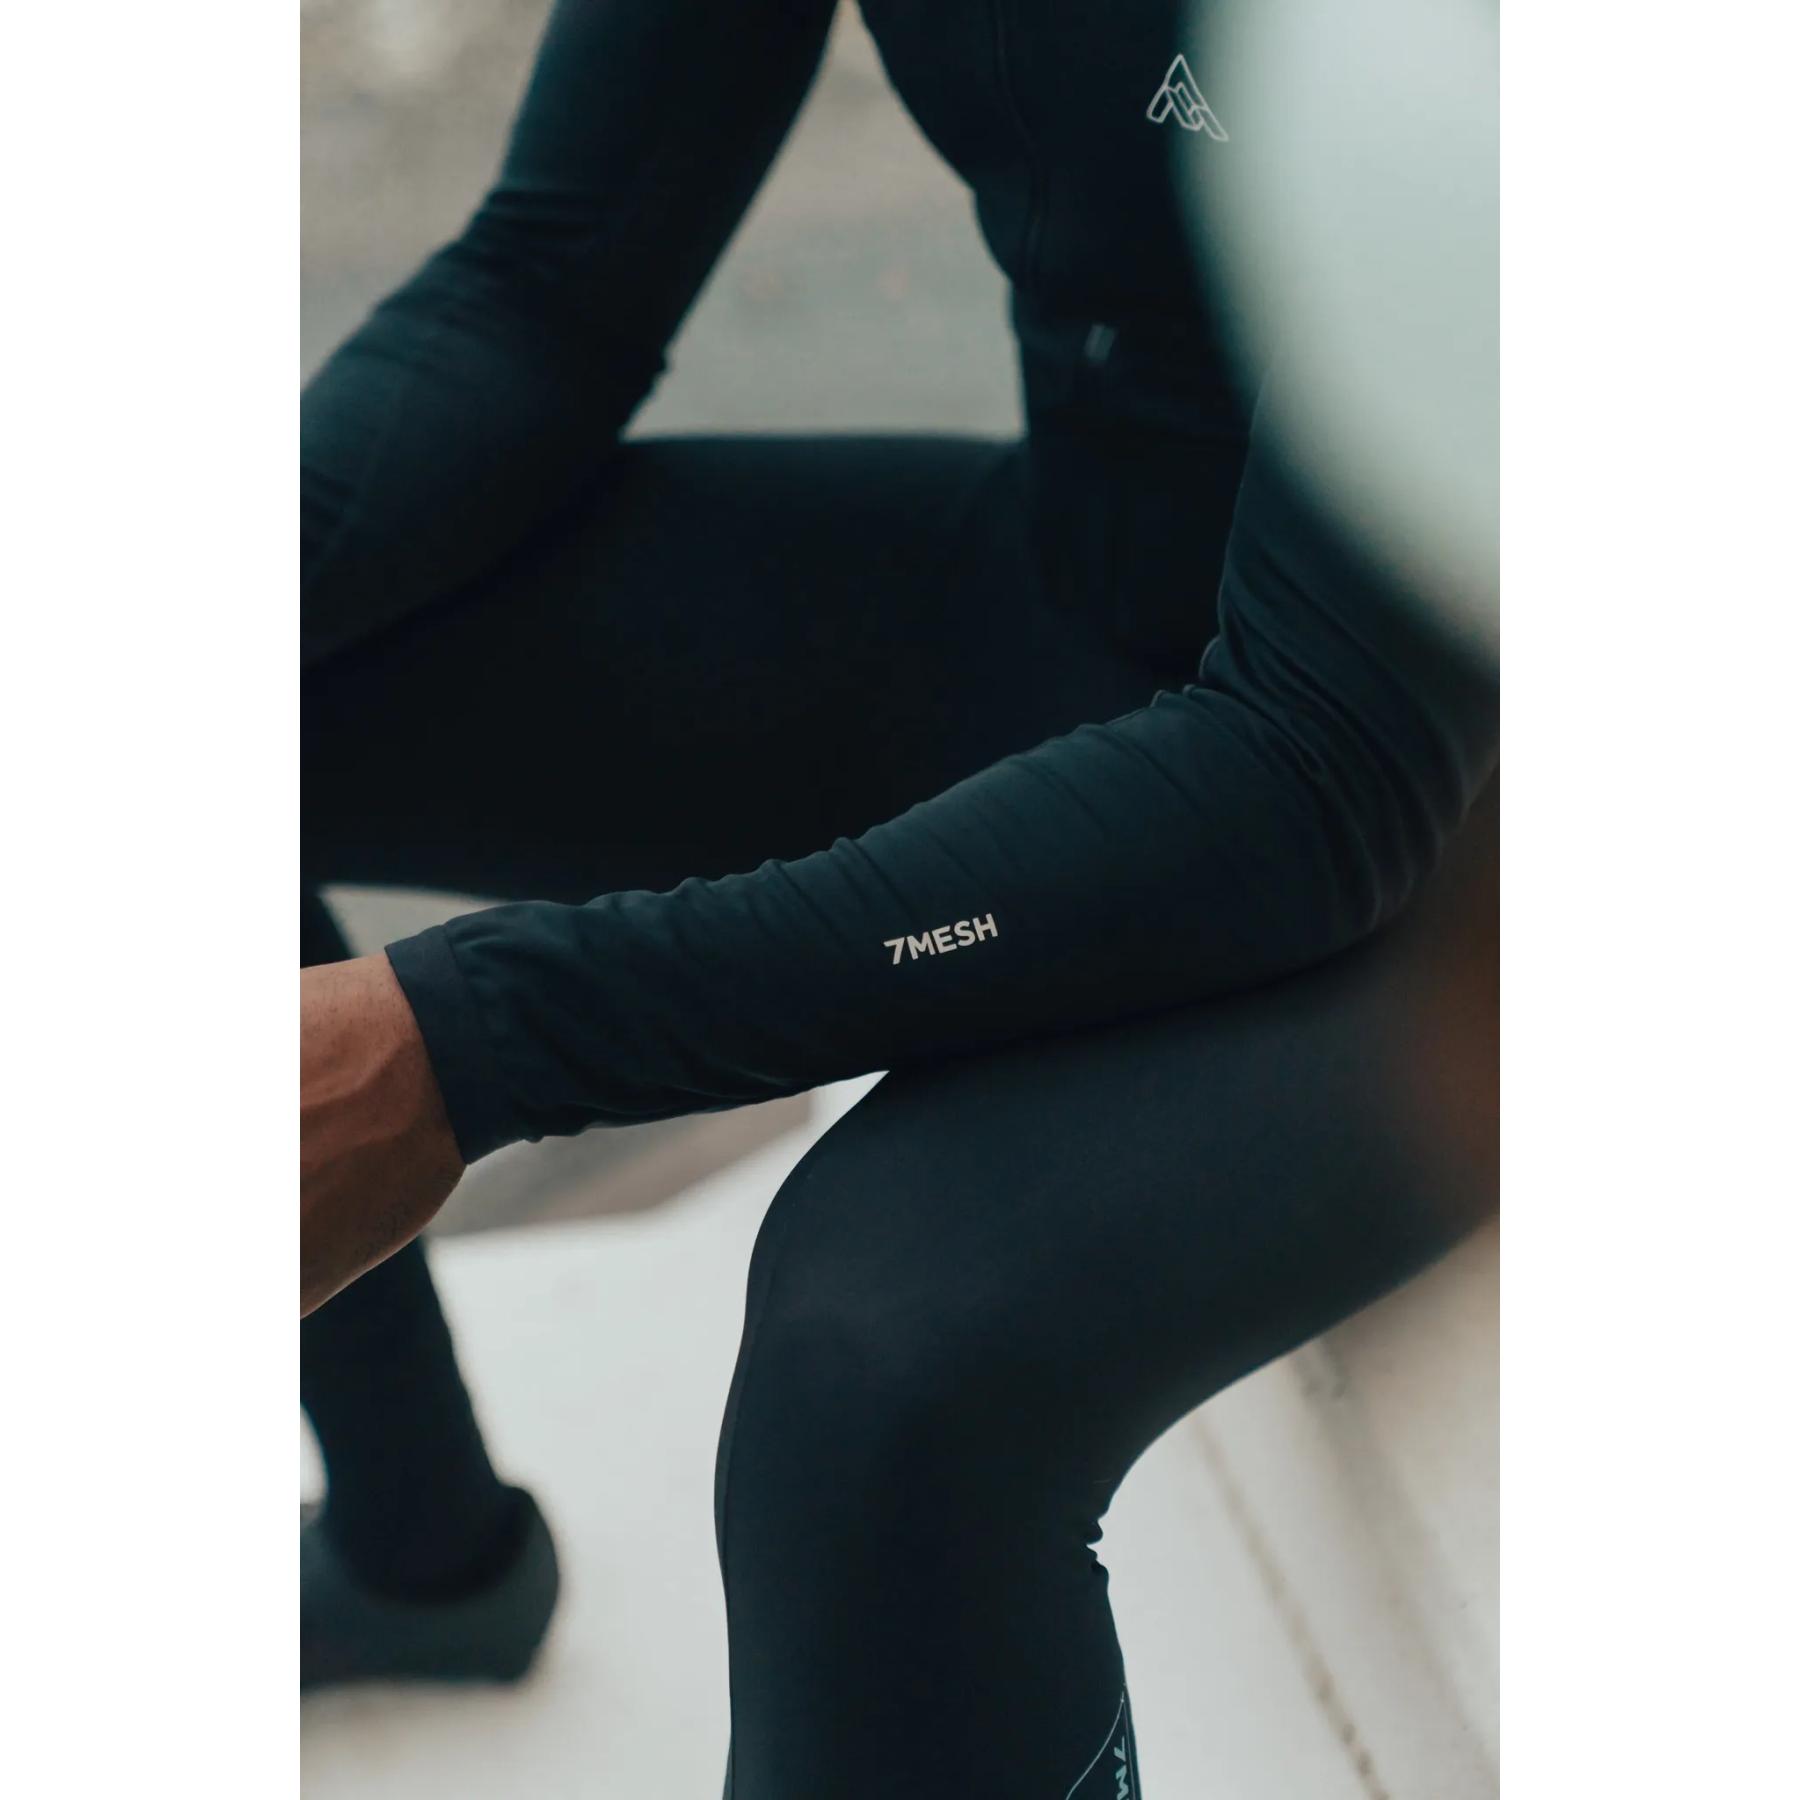 Image of 7mesh Synergy Men's Long Sleeve Jersey - Black